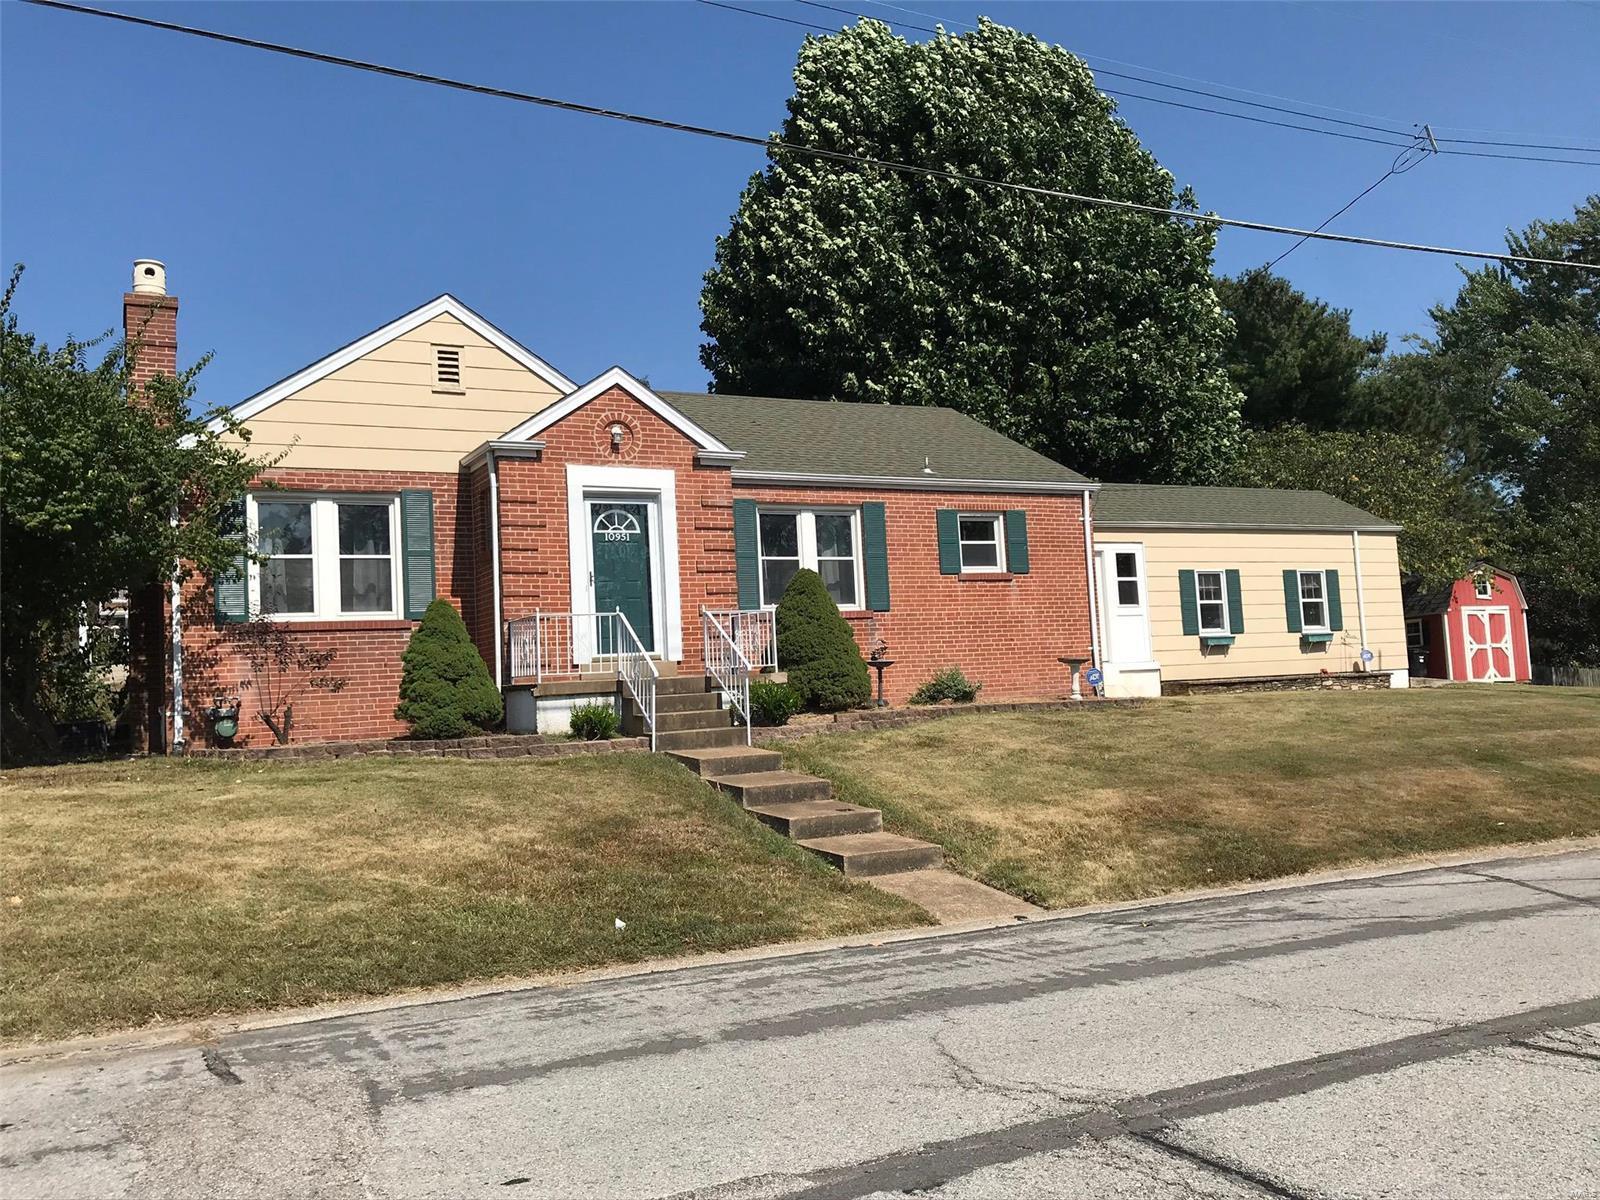 10951 Cosmos Property Photo - Affton, MO real estate listing